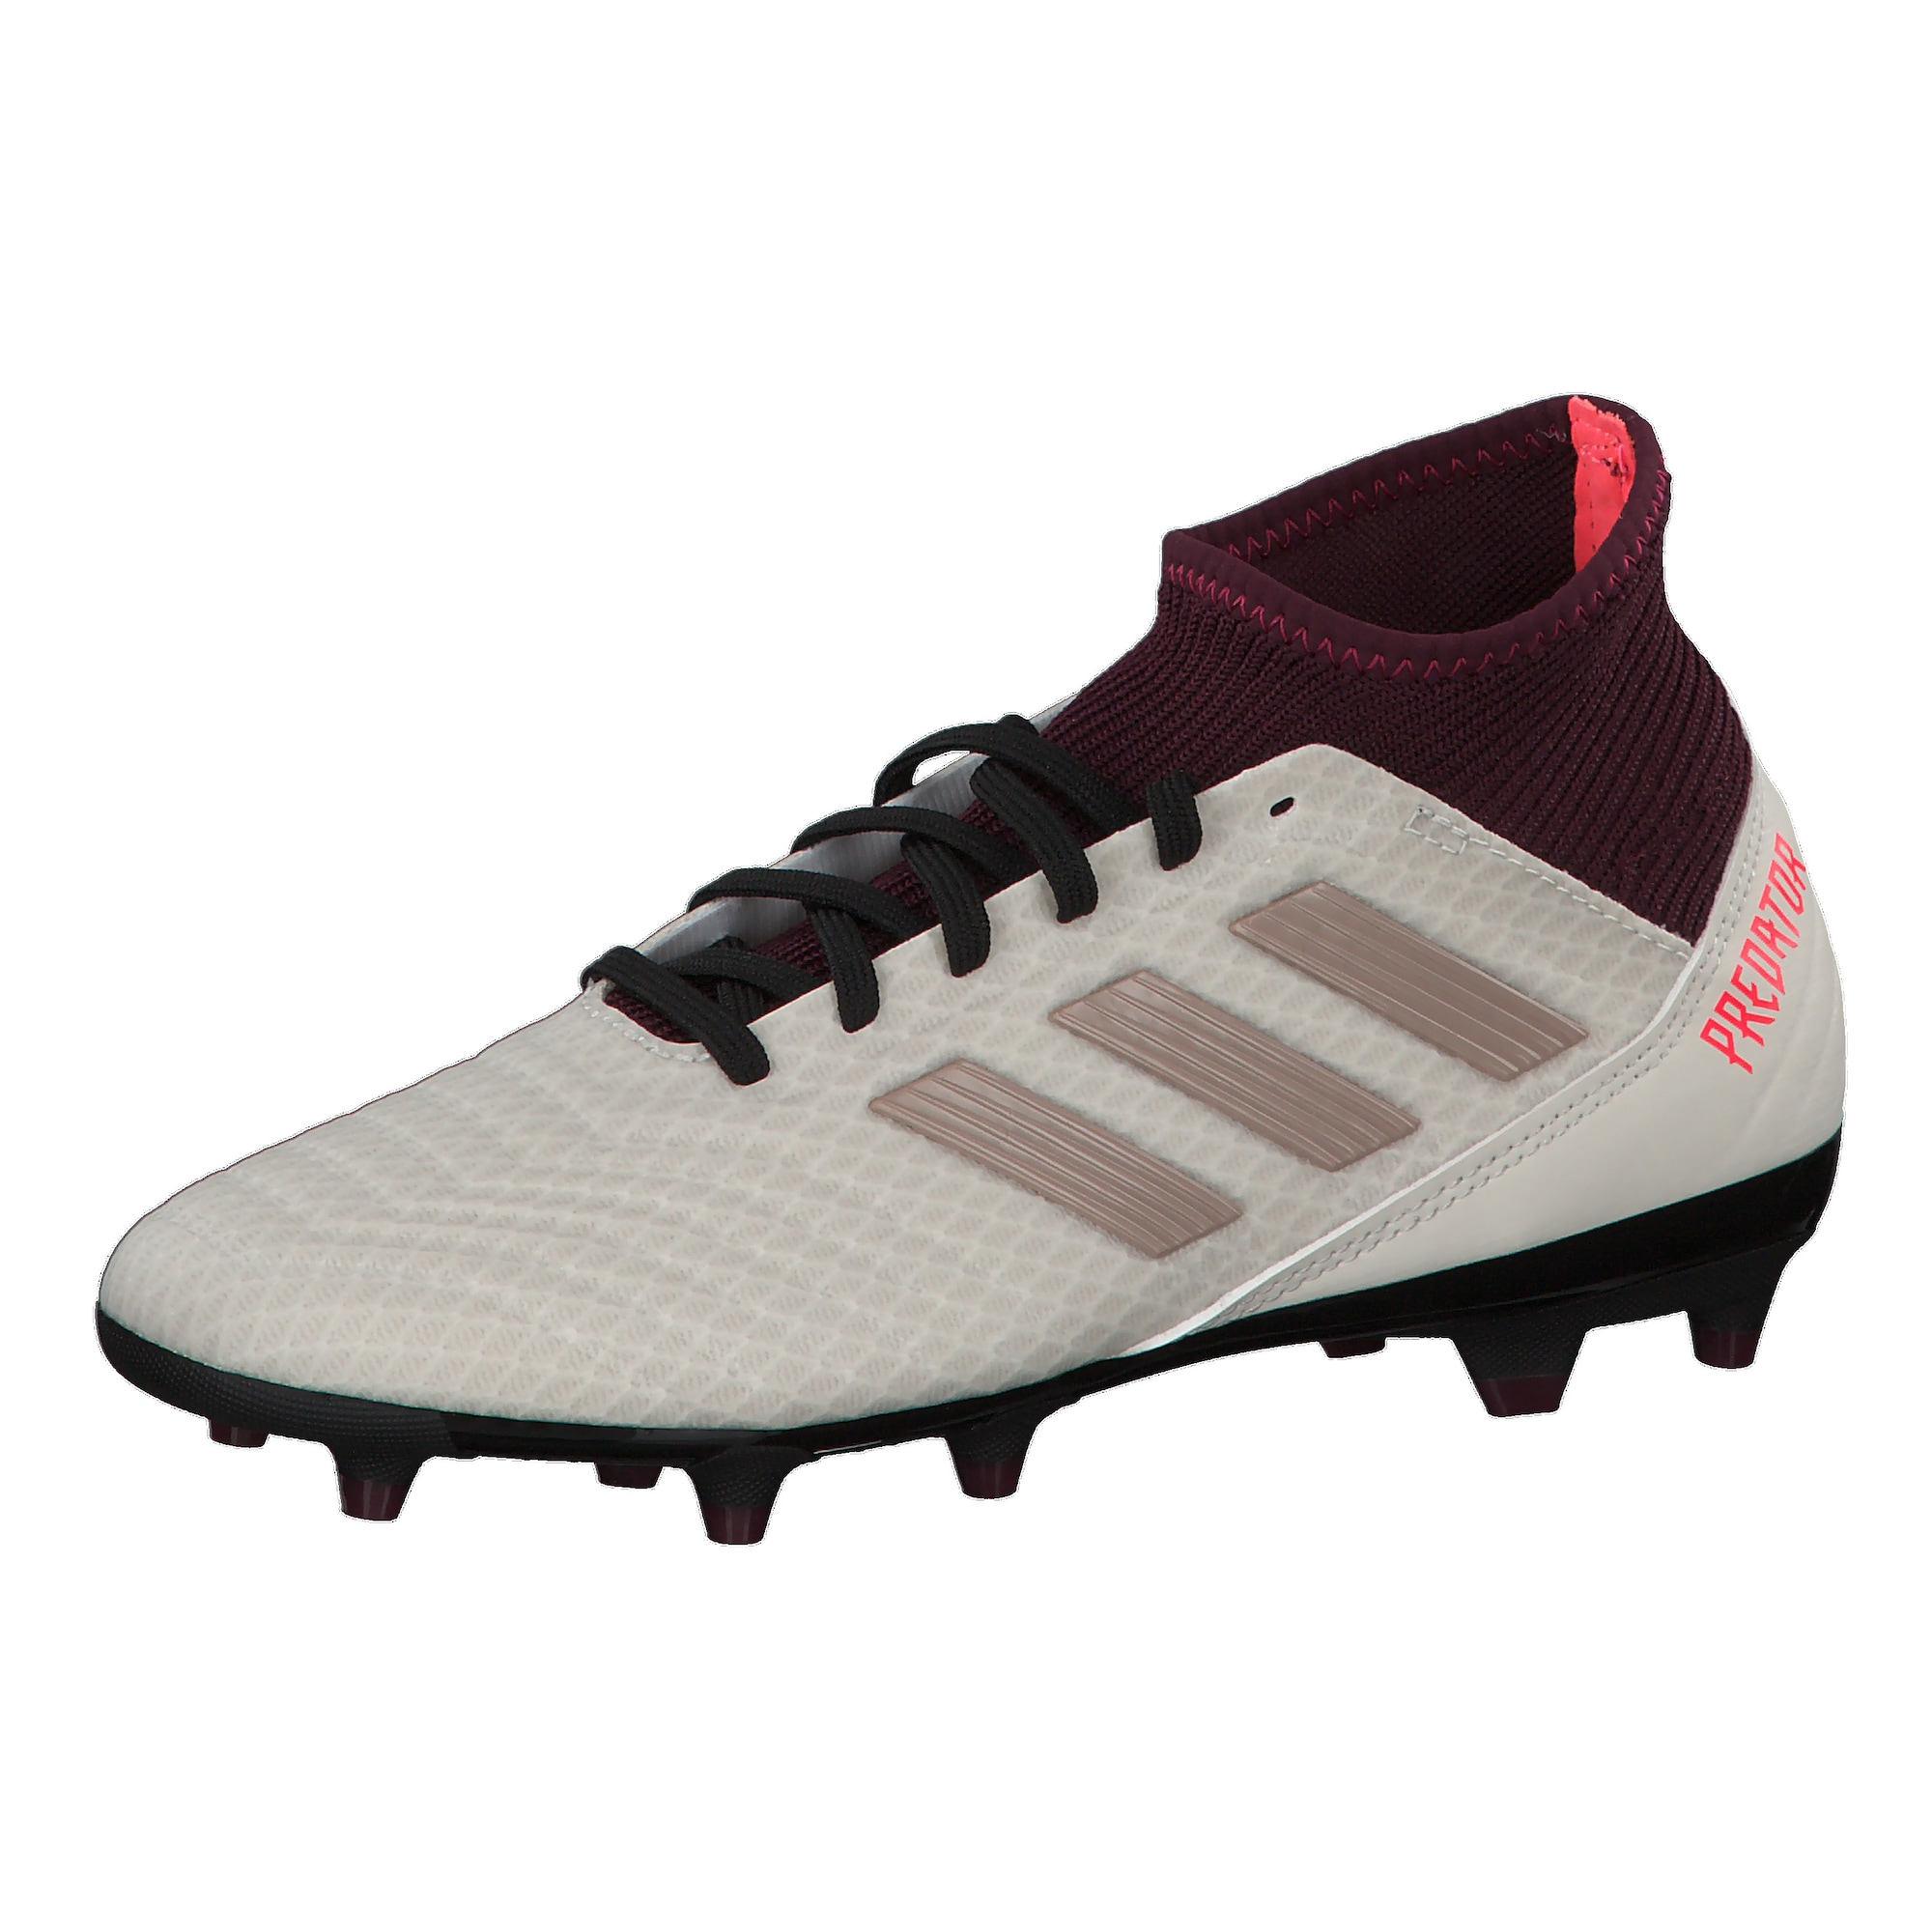 Fußballschuhe 'PREDATOR 18.3 FG' mit PrimeMesh-Obermaterial DB2511 | Schuhe > Sportschuhe > Fußballschuhe | Rot | ADIDAS PERFORMANCE